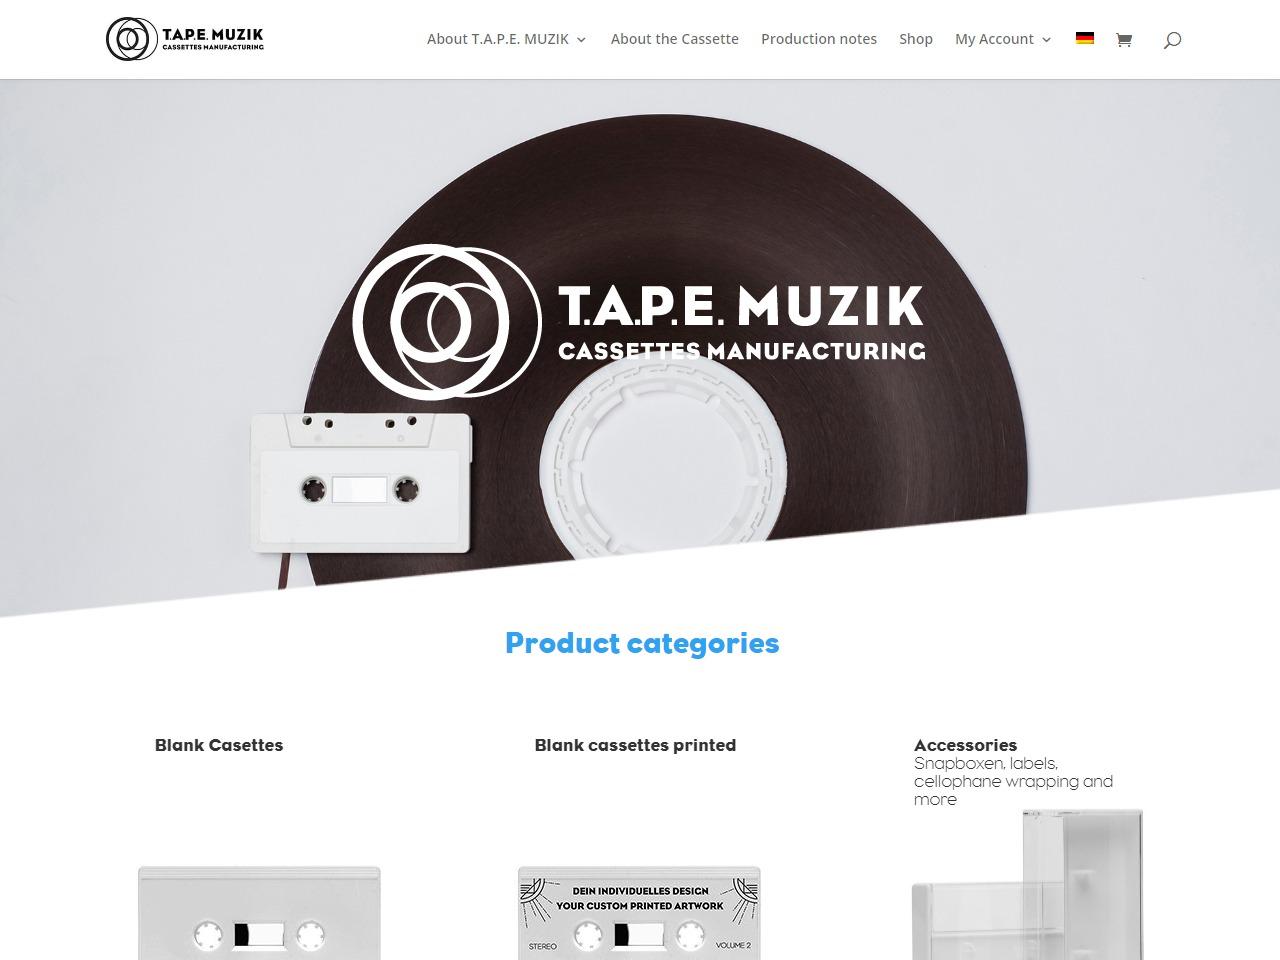 T A P E MUZIK - Shop - Custom-Made Cassette Tapes and Accessories